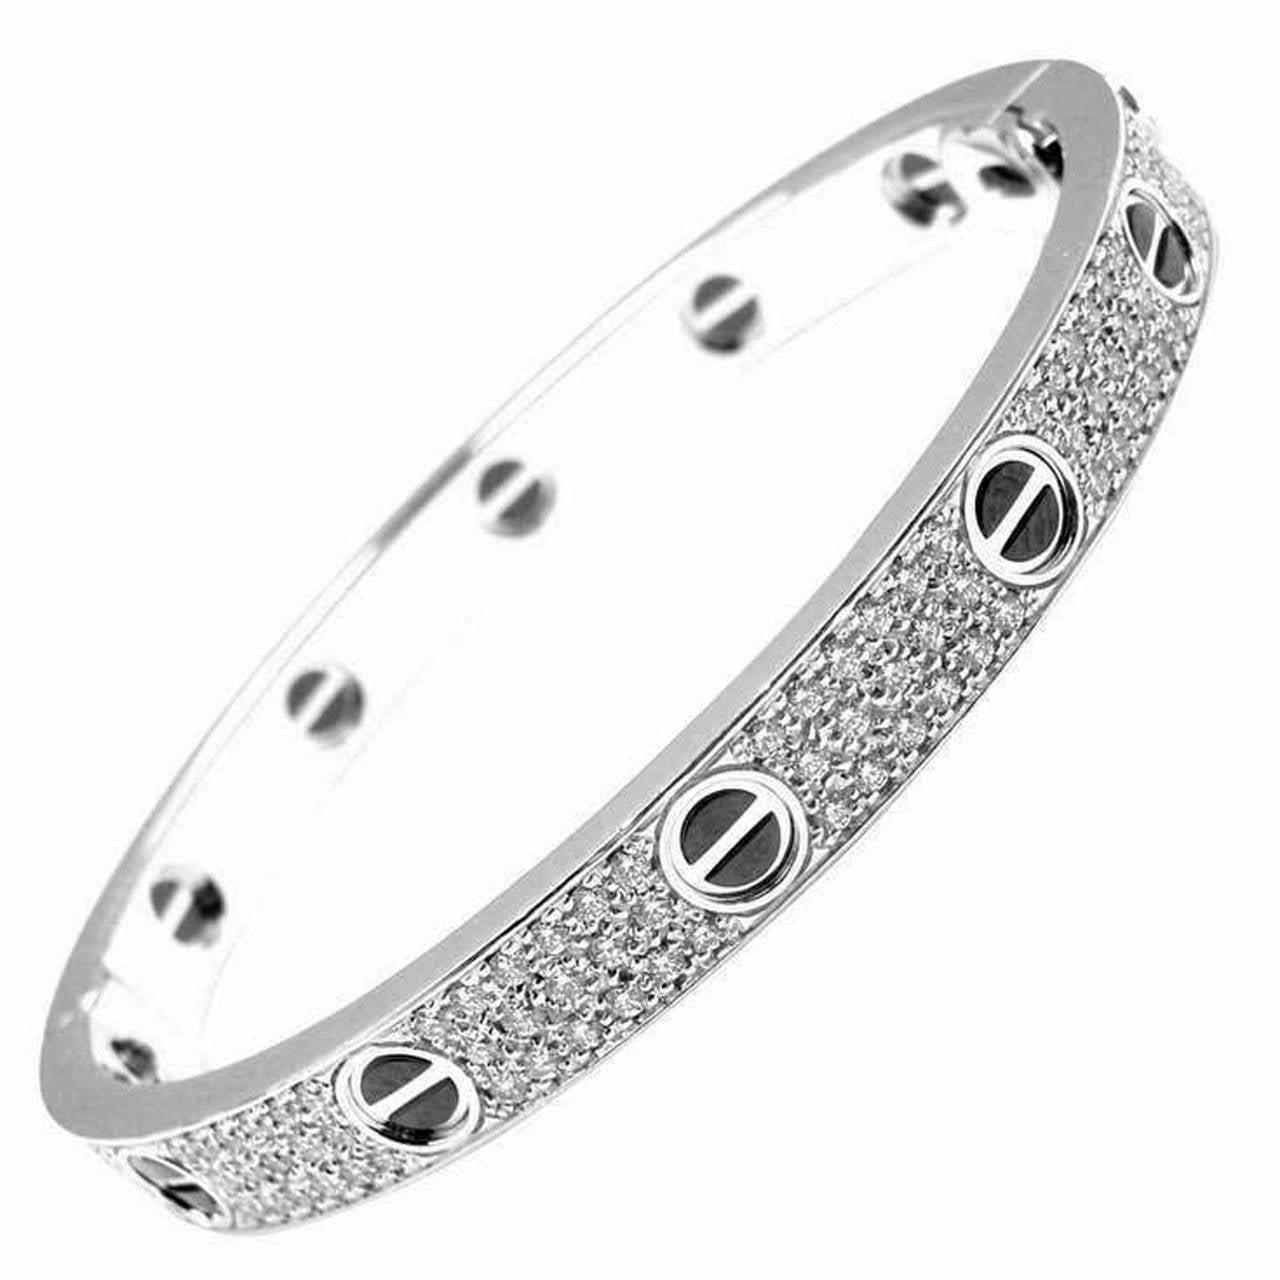 24f6951a5 Cartier Ceramic Diamond Gold Love Bangle Bracelet at 1stdibs